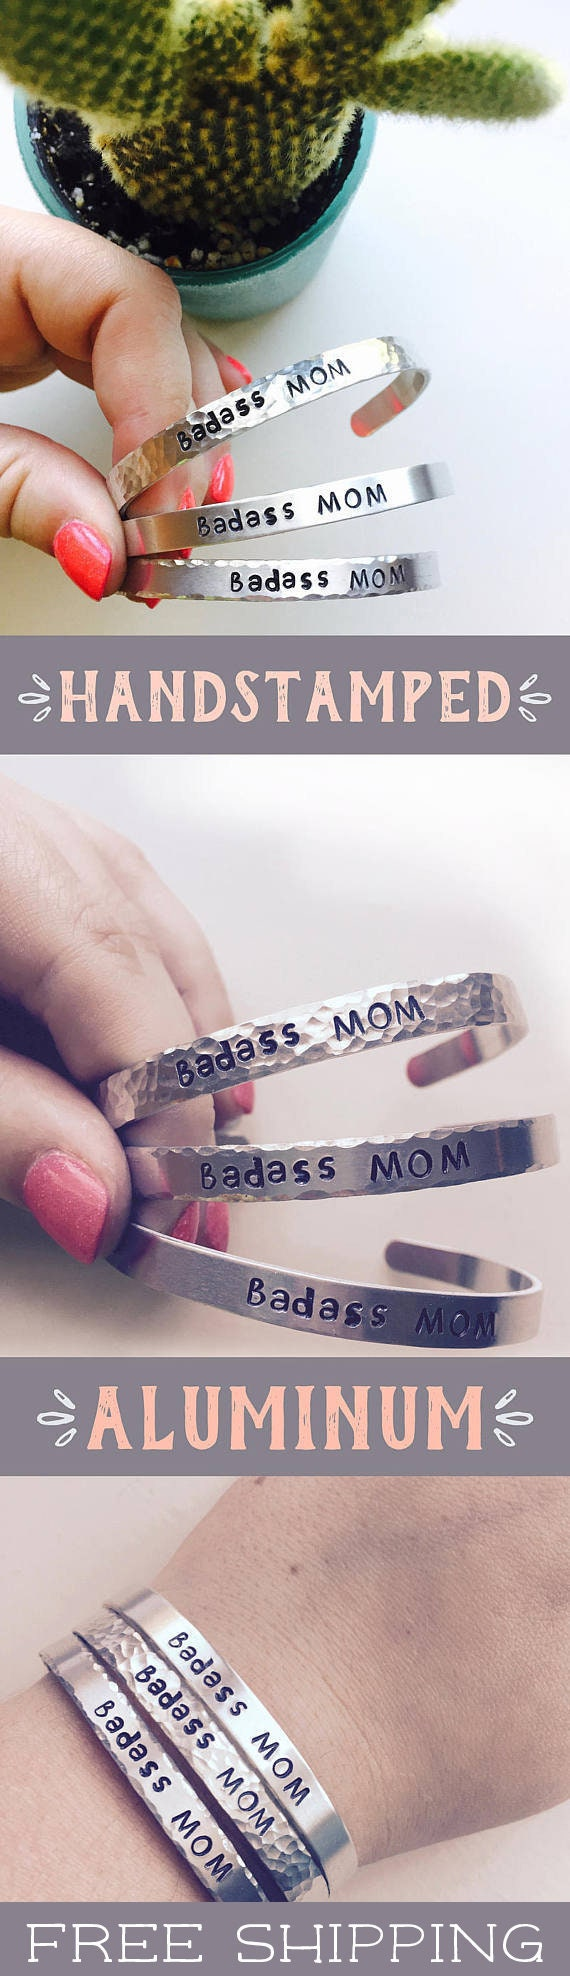 Christmas Gifts For Mom Badass Mom Handstamped Bracelet | Etsy